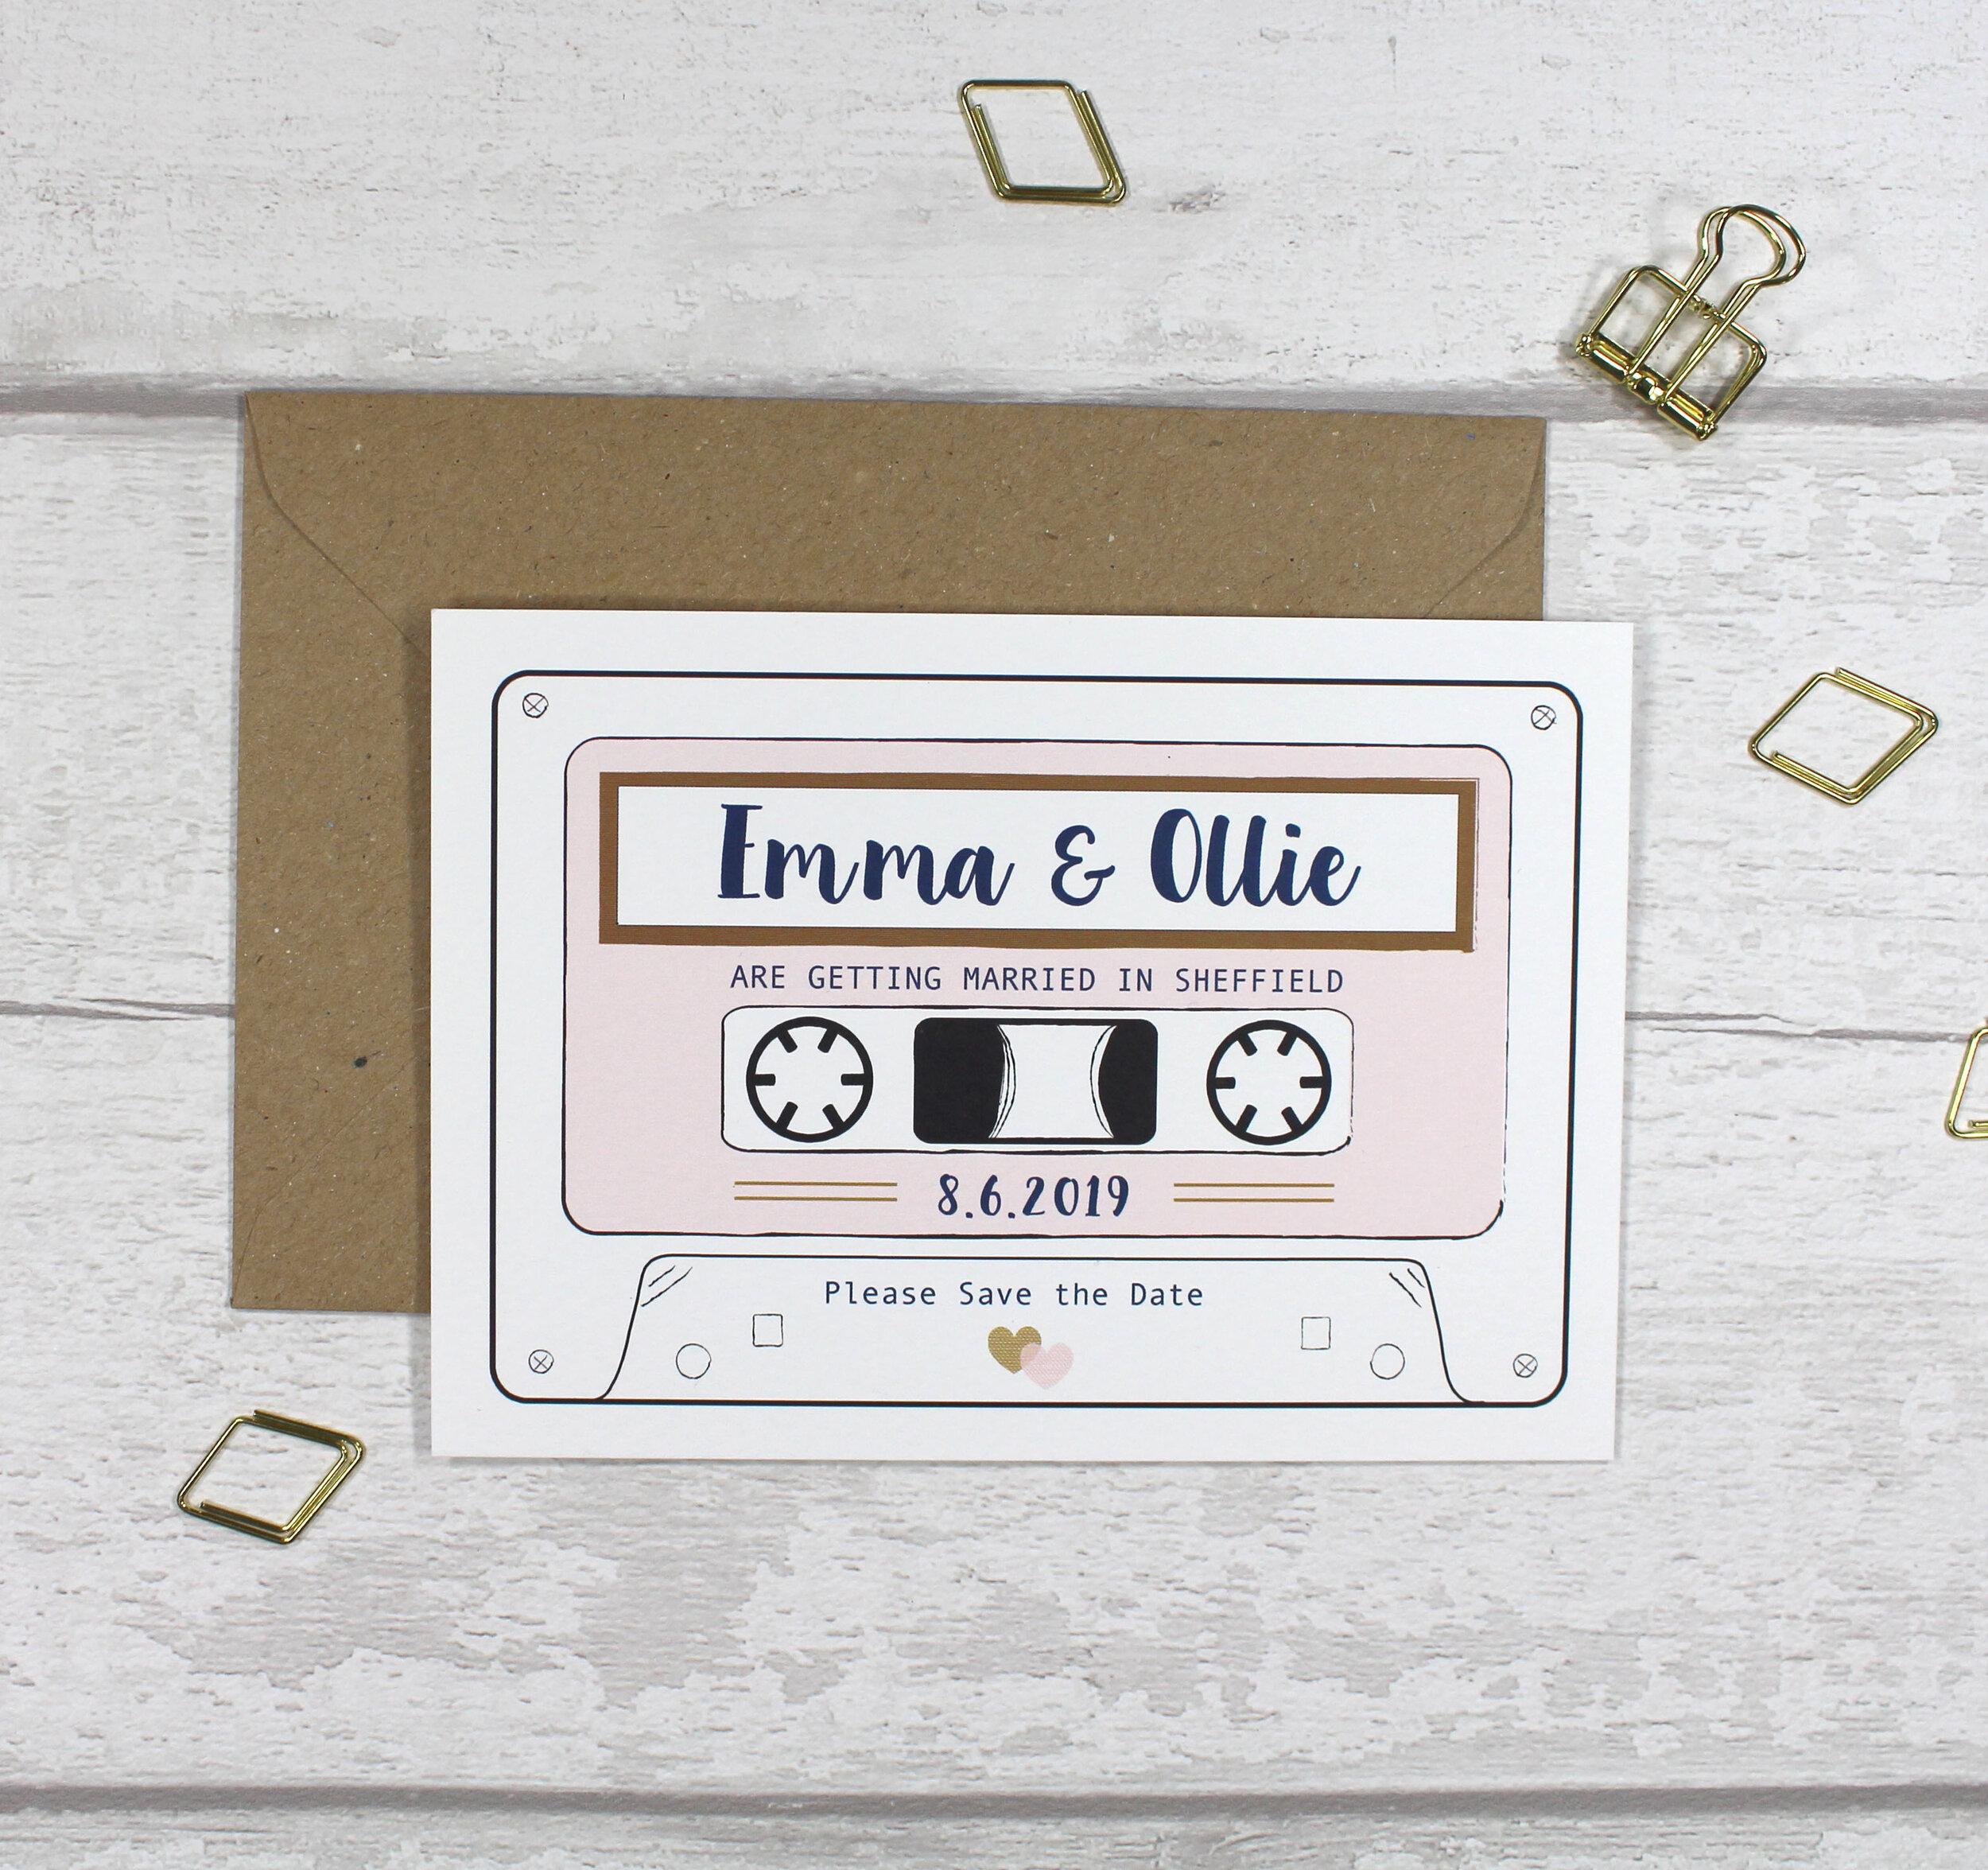 Ollie & Emma save the date-cassette.jpg